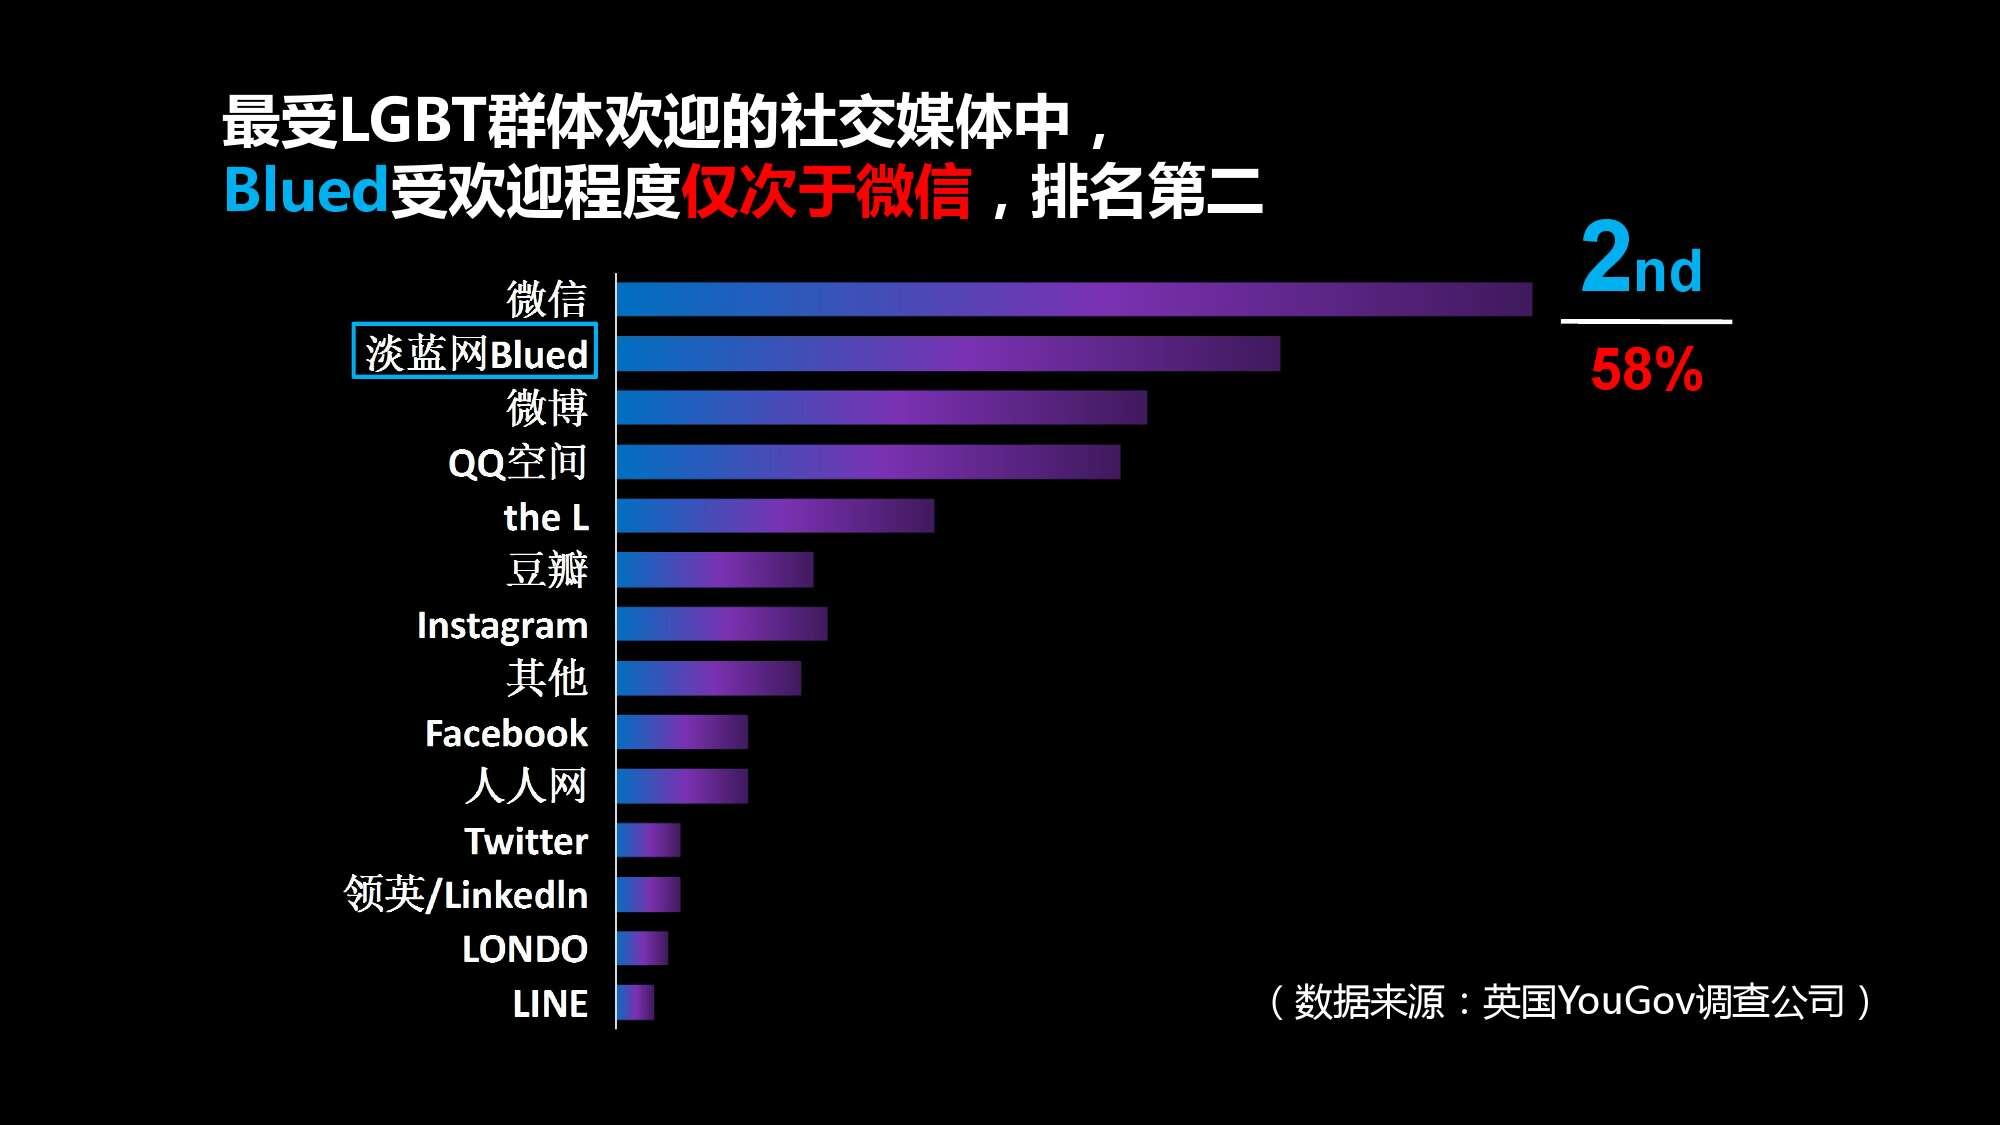 Blued2015中国同志社群大数据白皮书_000024